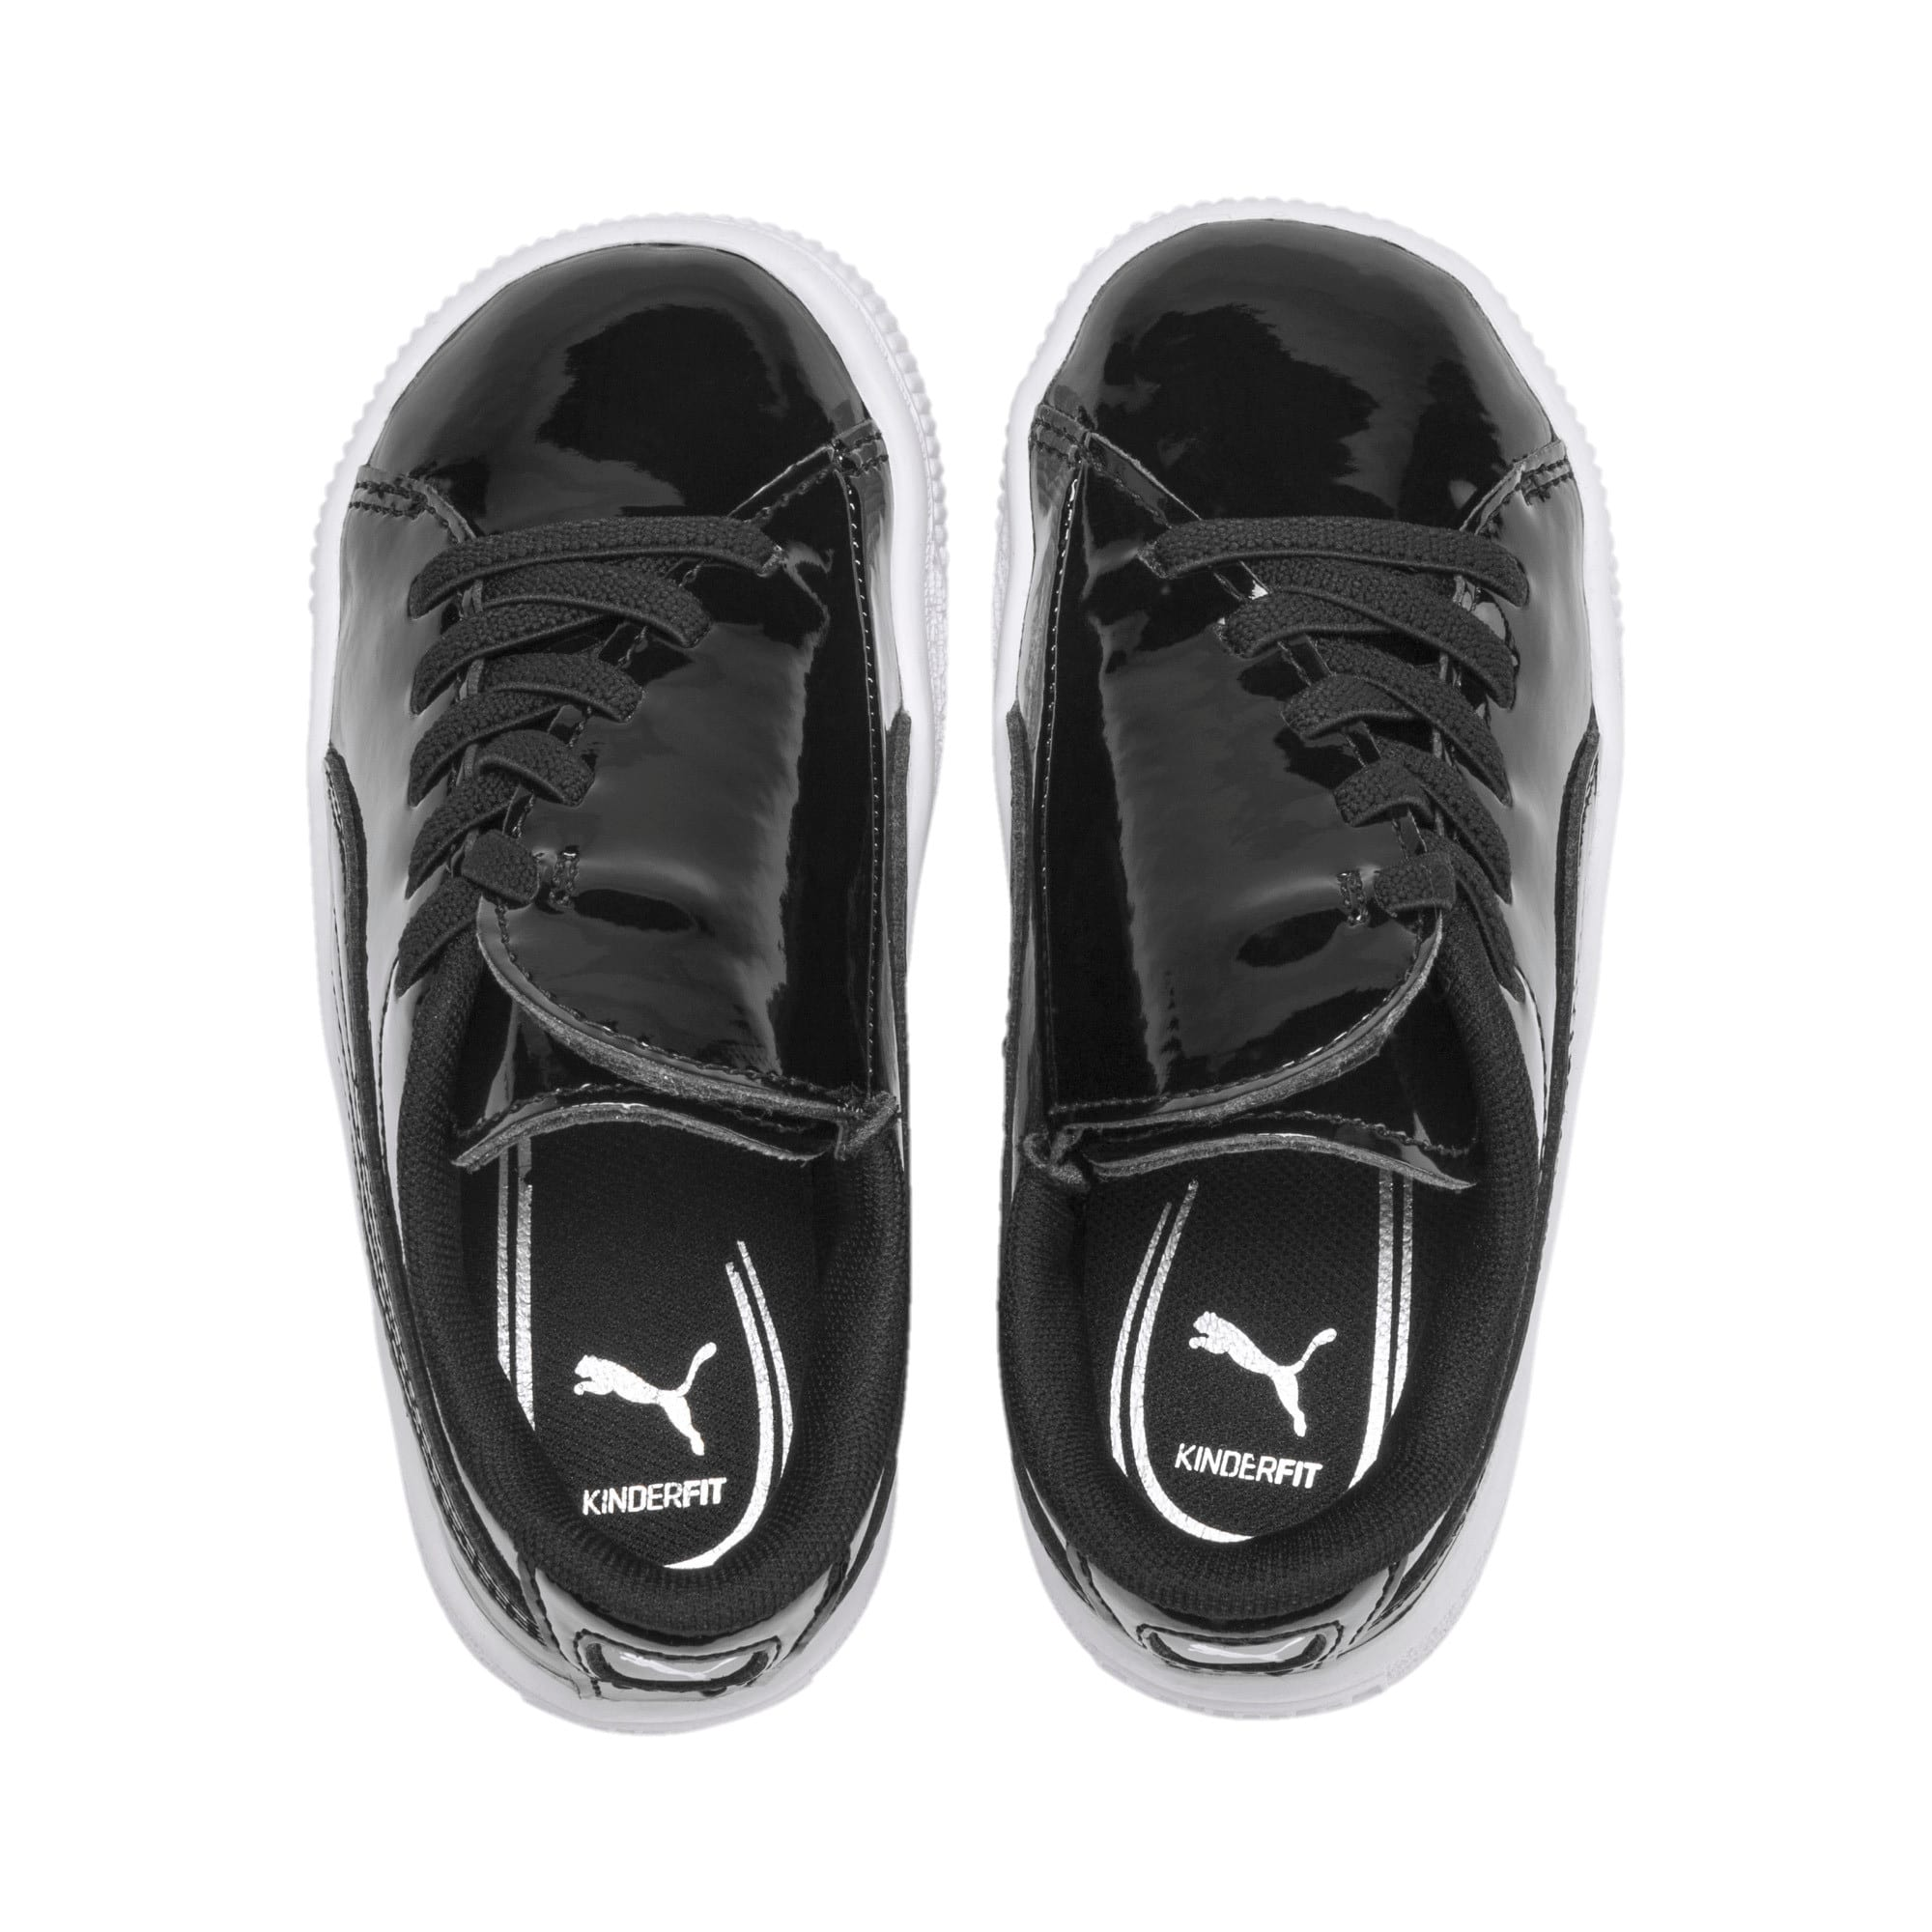 Thumbnail 6 of Basket Crush Patent AC Toddler Shoes, Puma Black-Puma White, medium